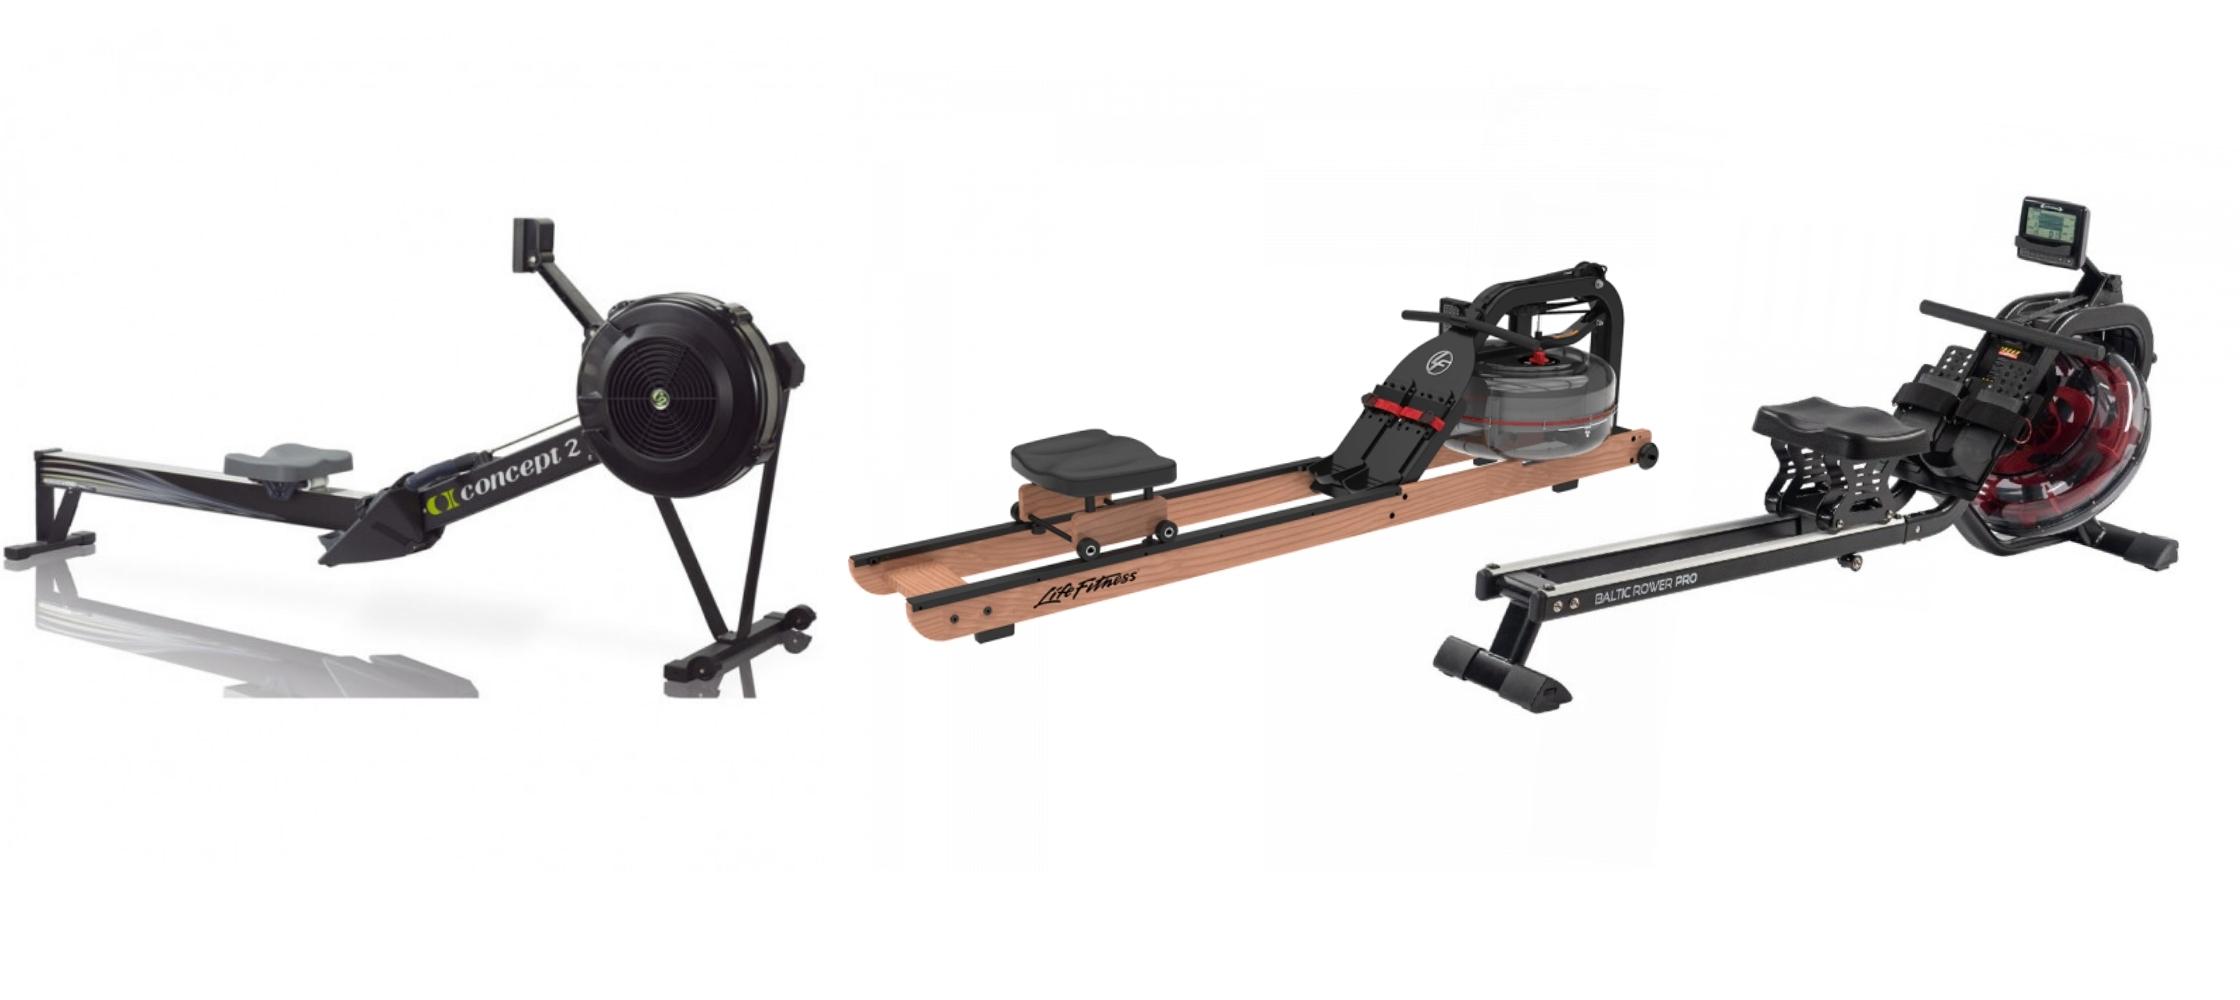 rowing machines rails